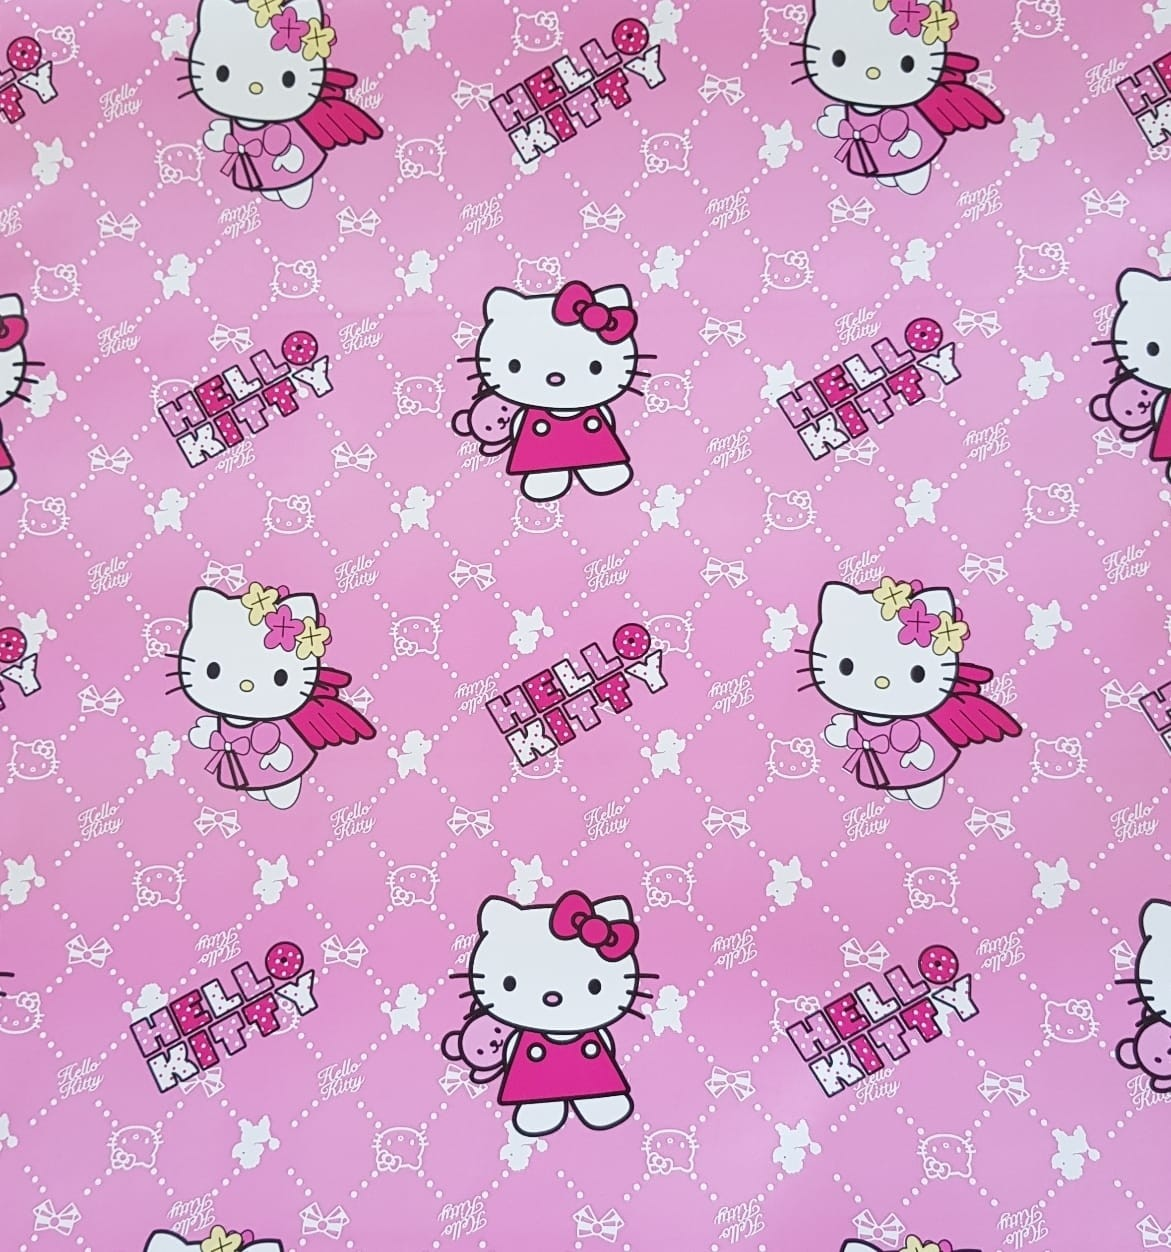 Papier Adhesif Decoratif HANYI Motif Hello kitty